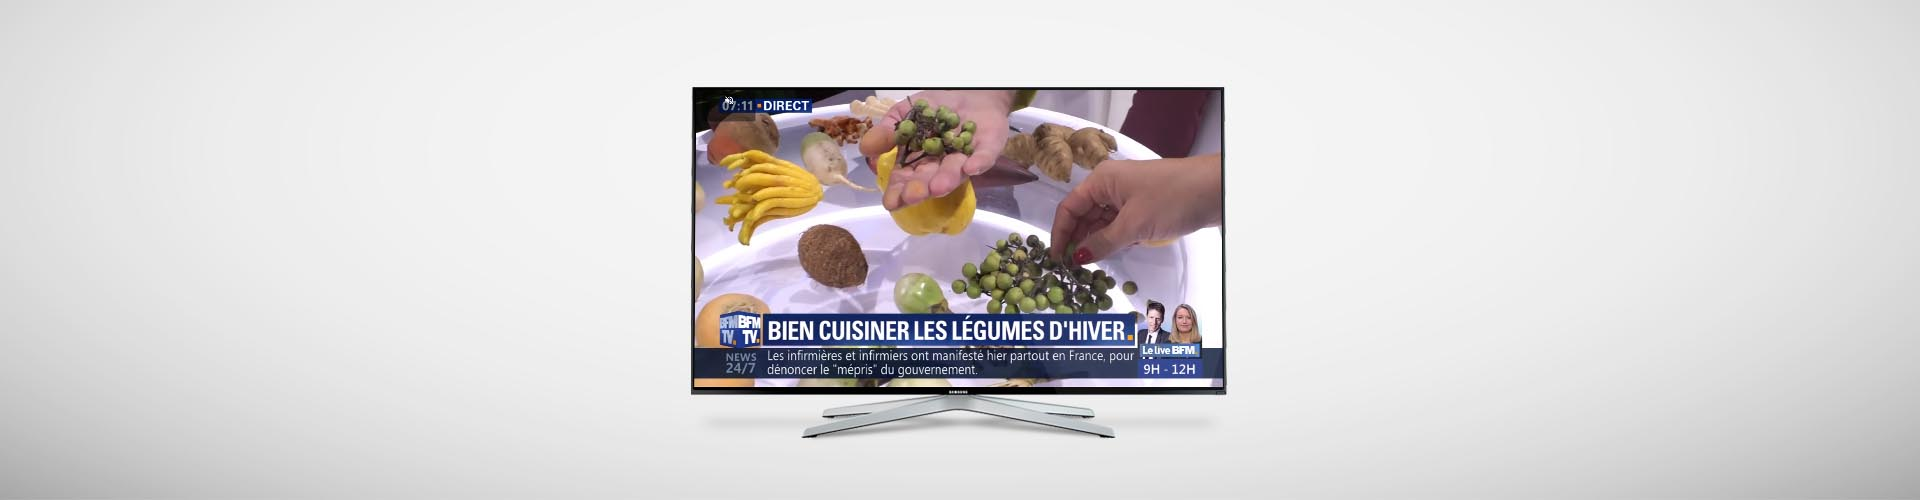 Header Actu Plateau BFMTV Emission Bien cuisiner les Fruits et Légumes en Hiver - Frédéric Jaunault MOF Fruits Légumes